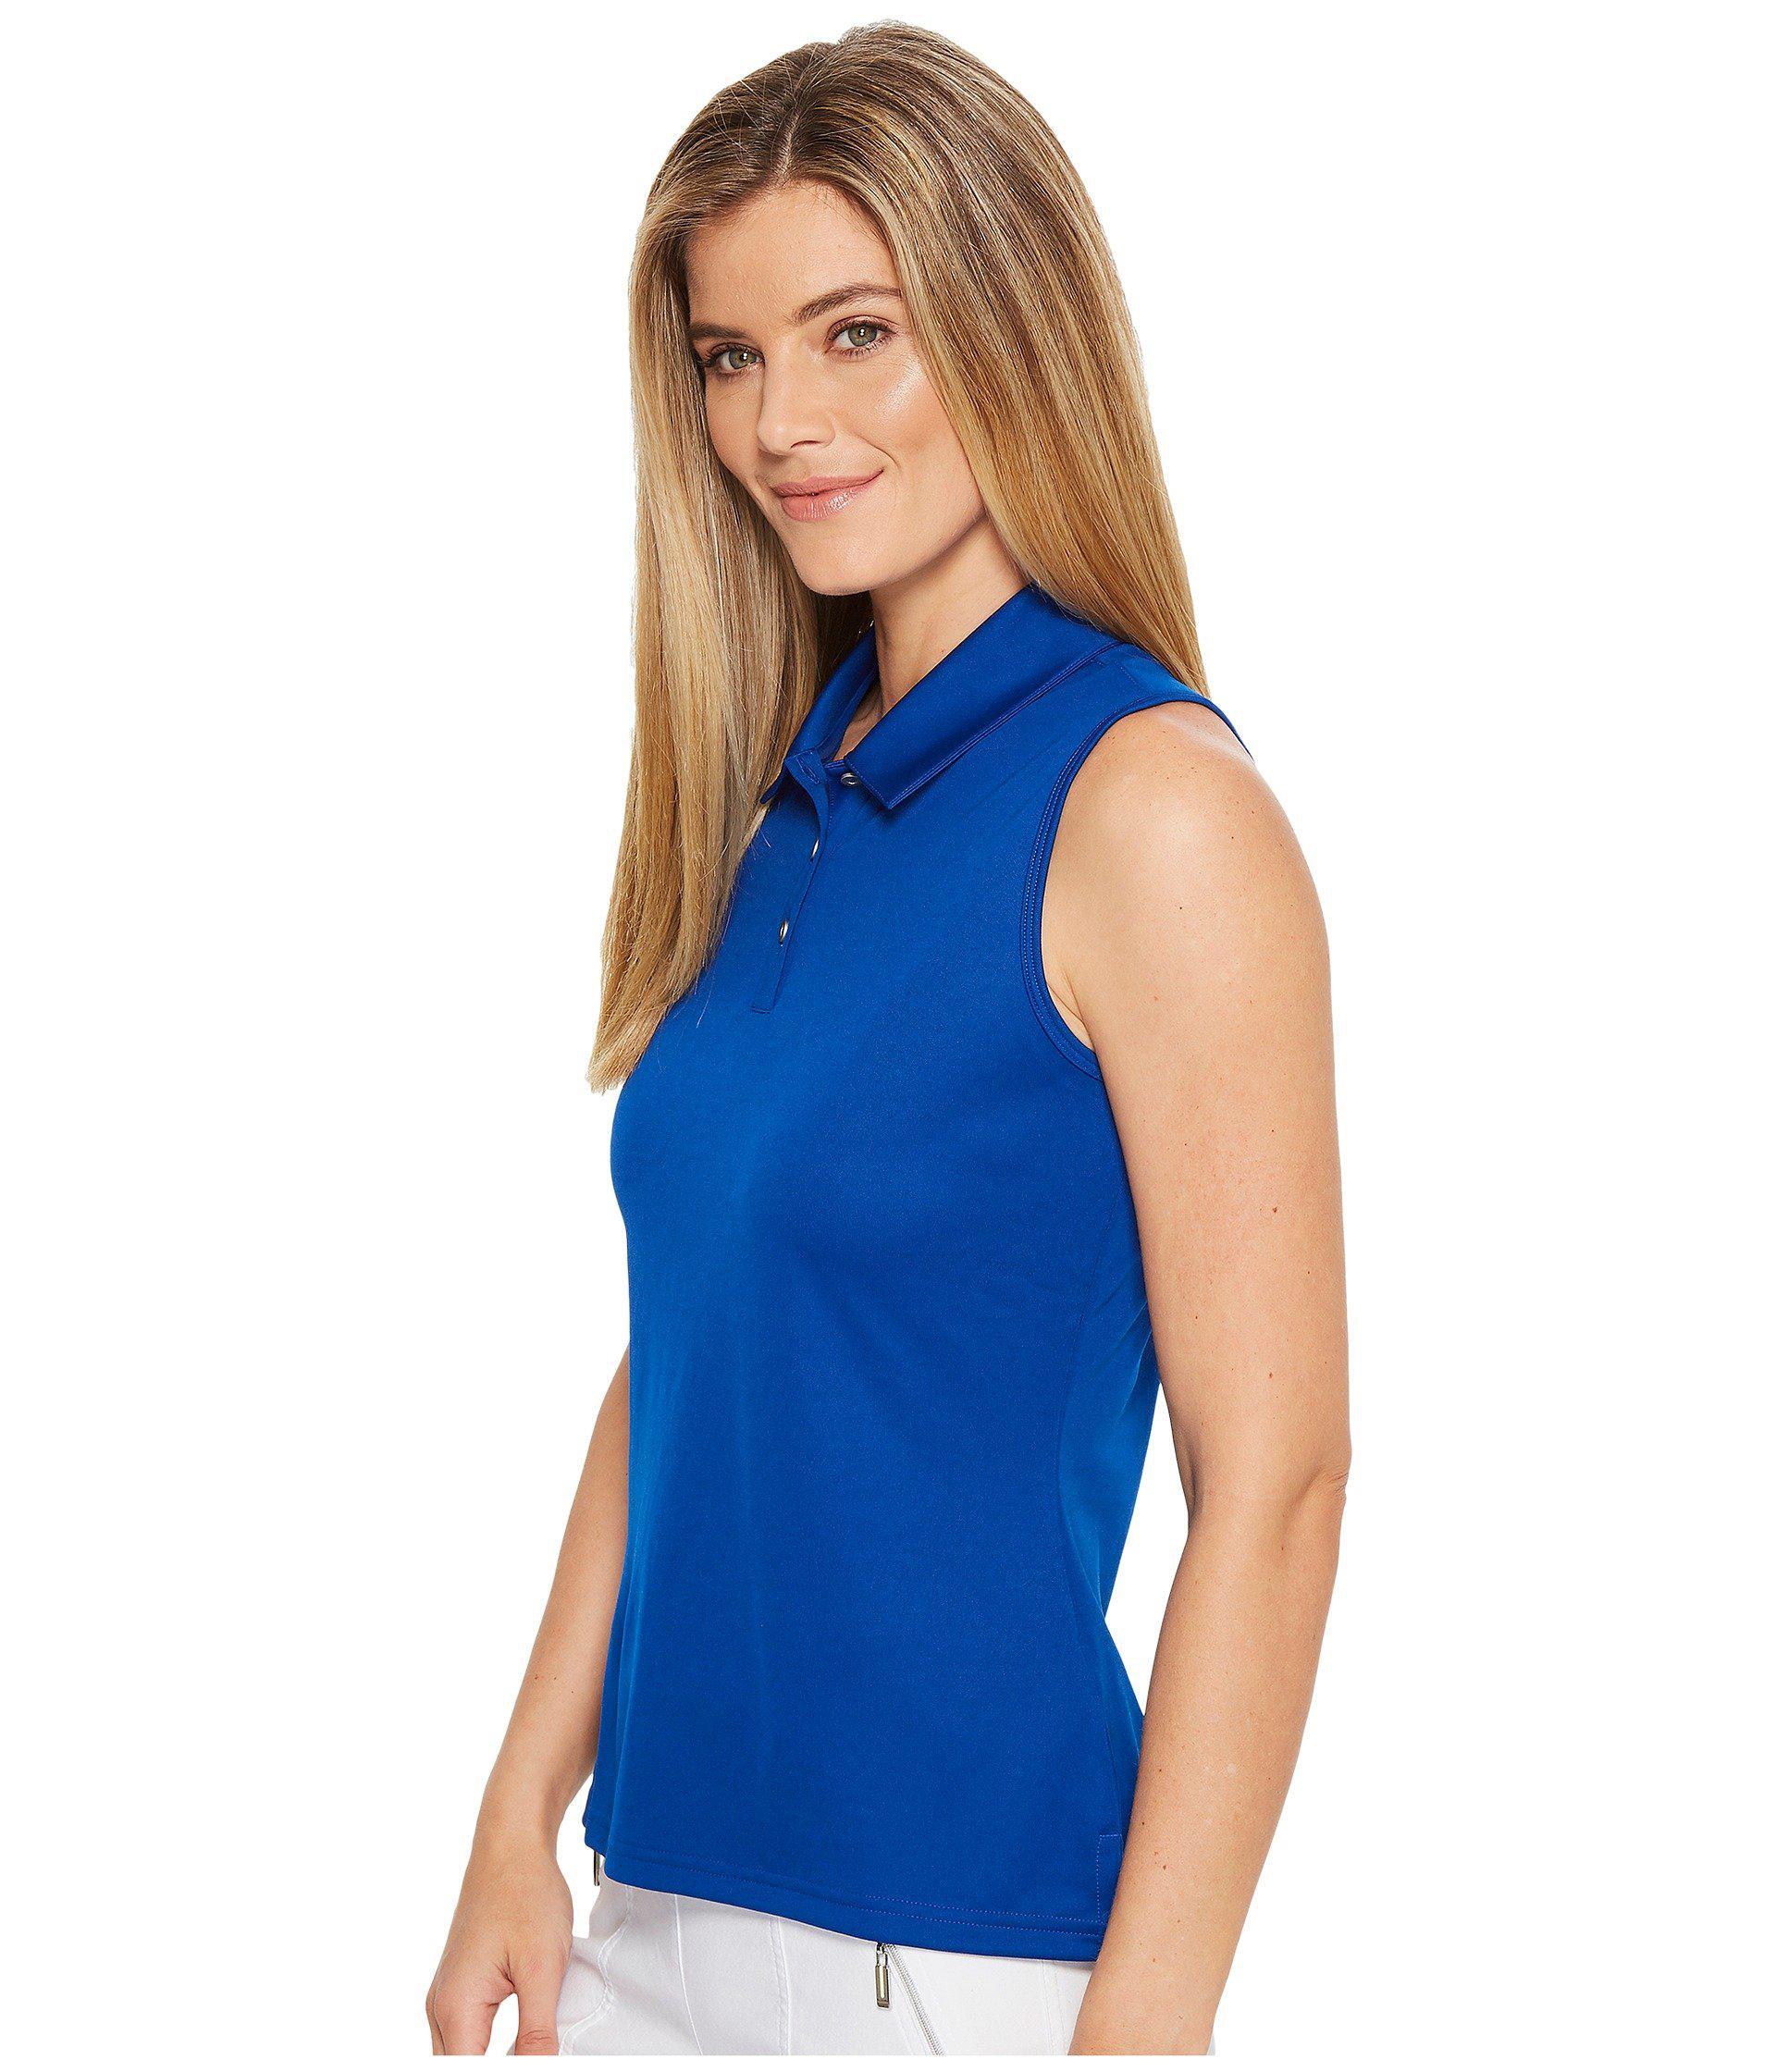 661dc3b6153be Lyst - adidas Originals Performance Sleeveless Polo (black) Women's  Sleeveless in Blue